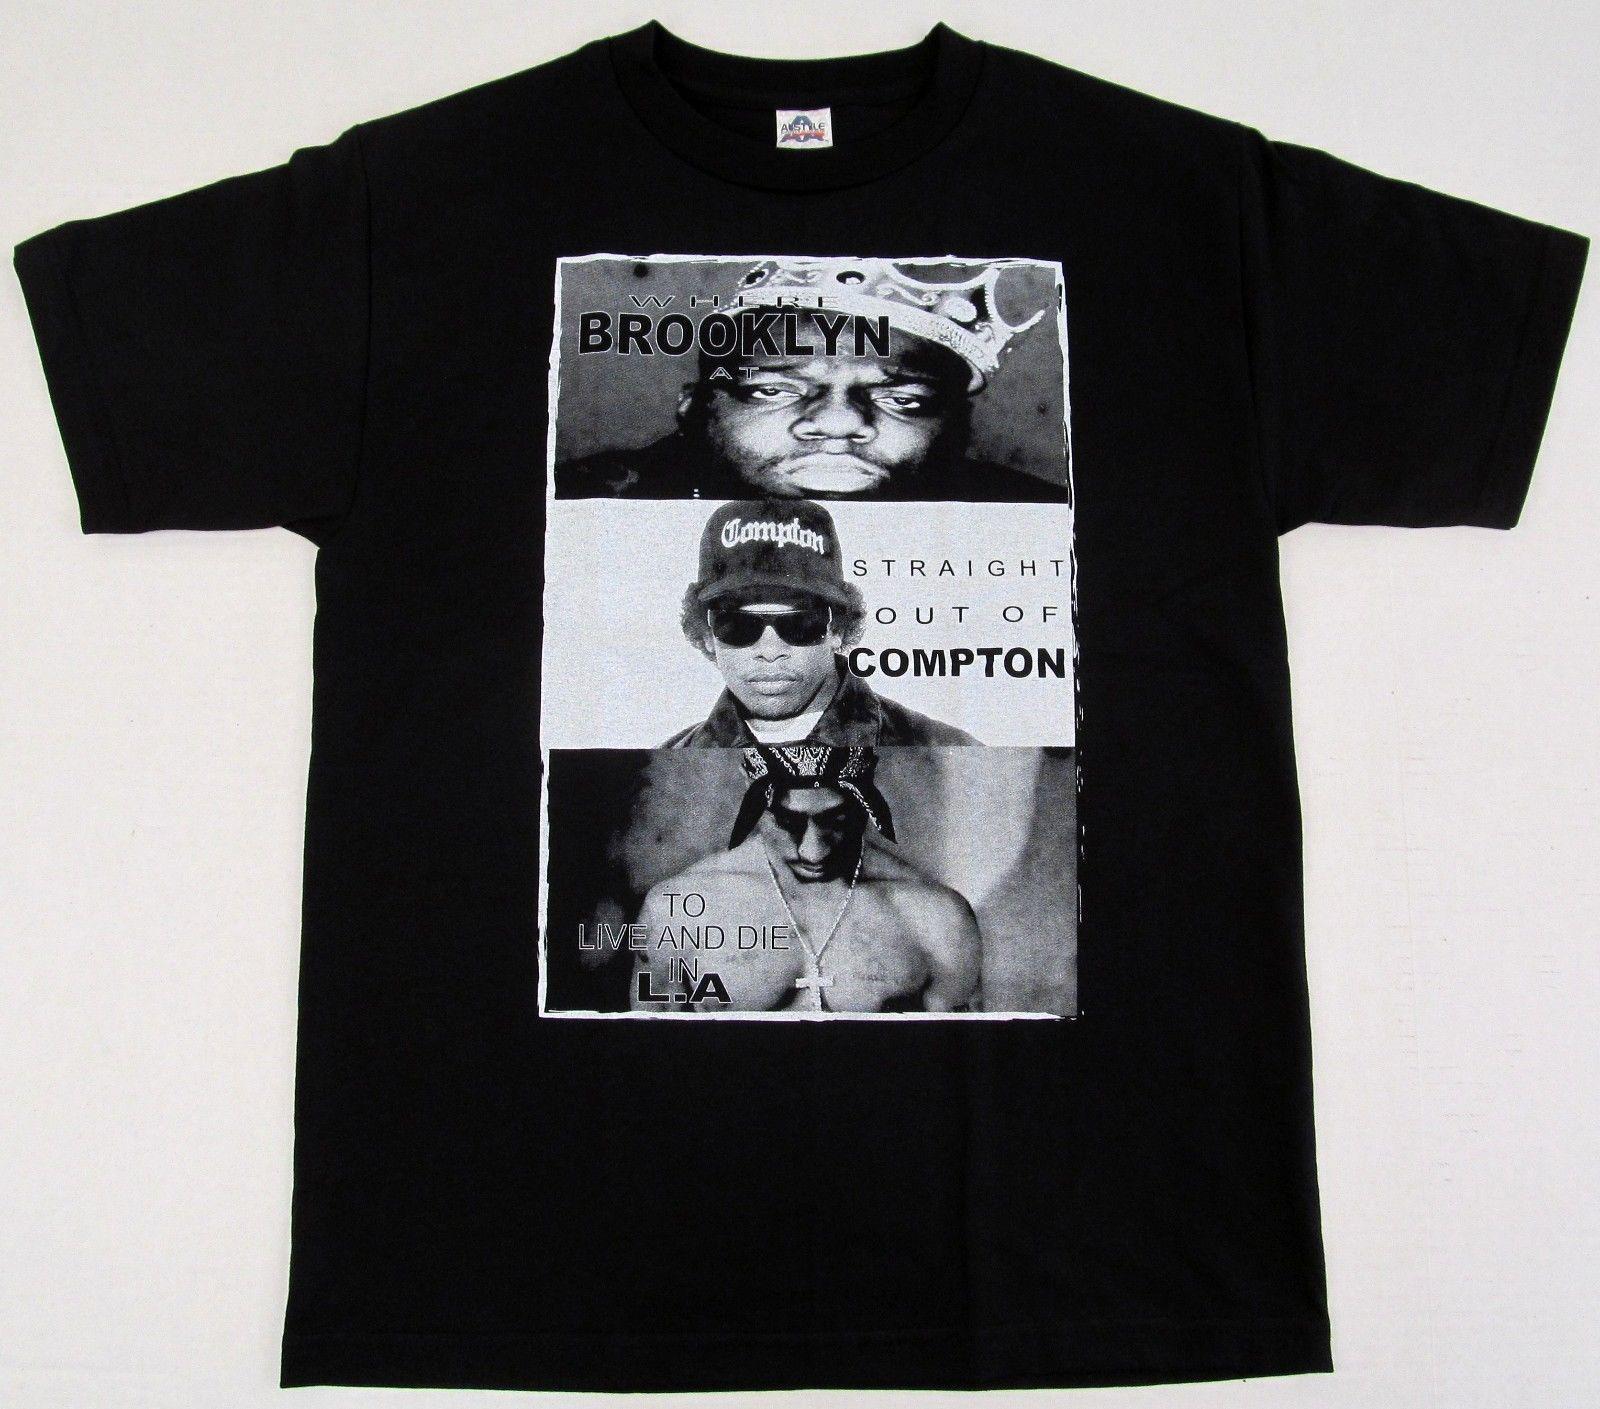 6715dae5b TUPAC BIGGIE EazyE T Shirt Hip Hop Rap Tee Notorious B.I.G. 2Pac Adult S 2XL  New Funny Vintage T Shirts T Shirts From Capoclothing42, $11.58| DHgate.Com